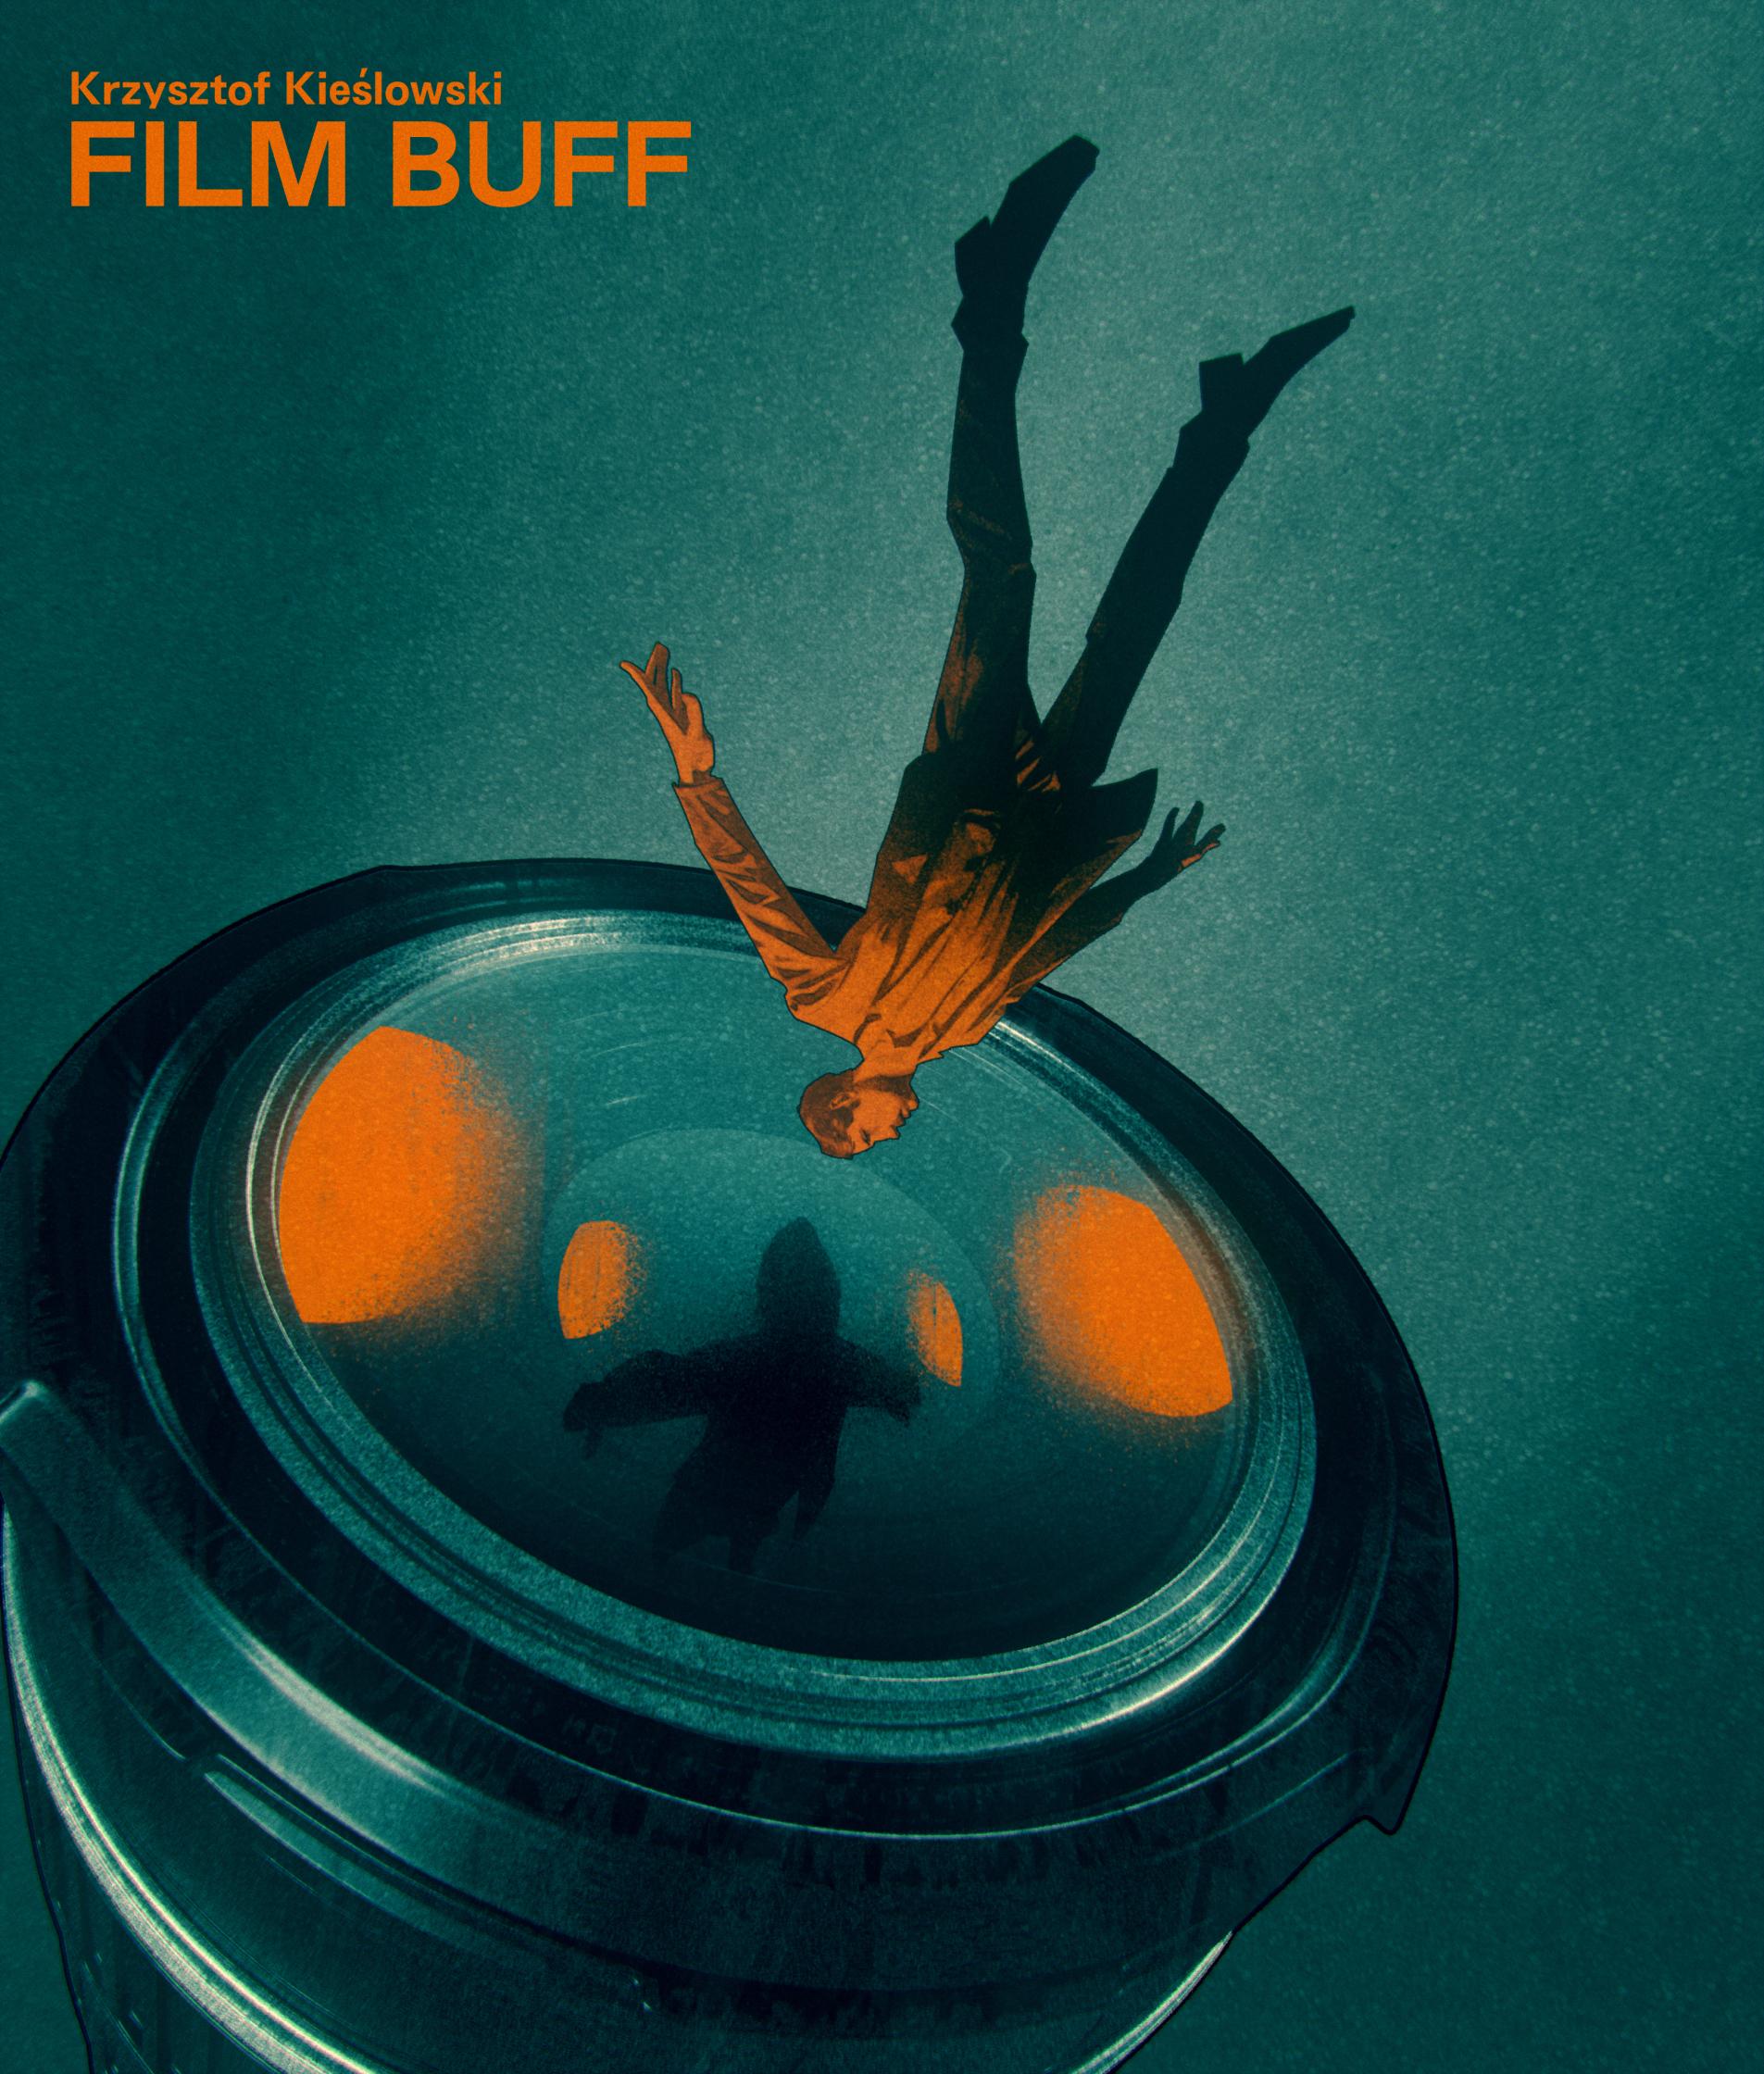 filmbuff_final.jpg